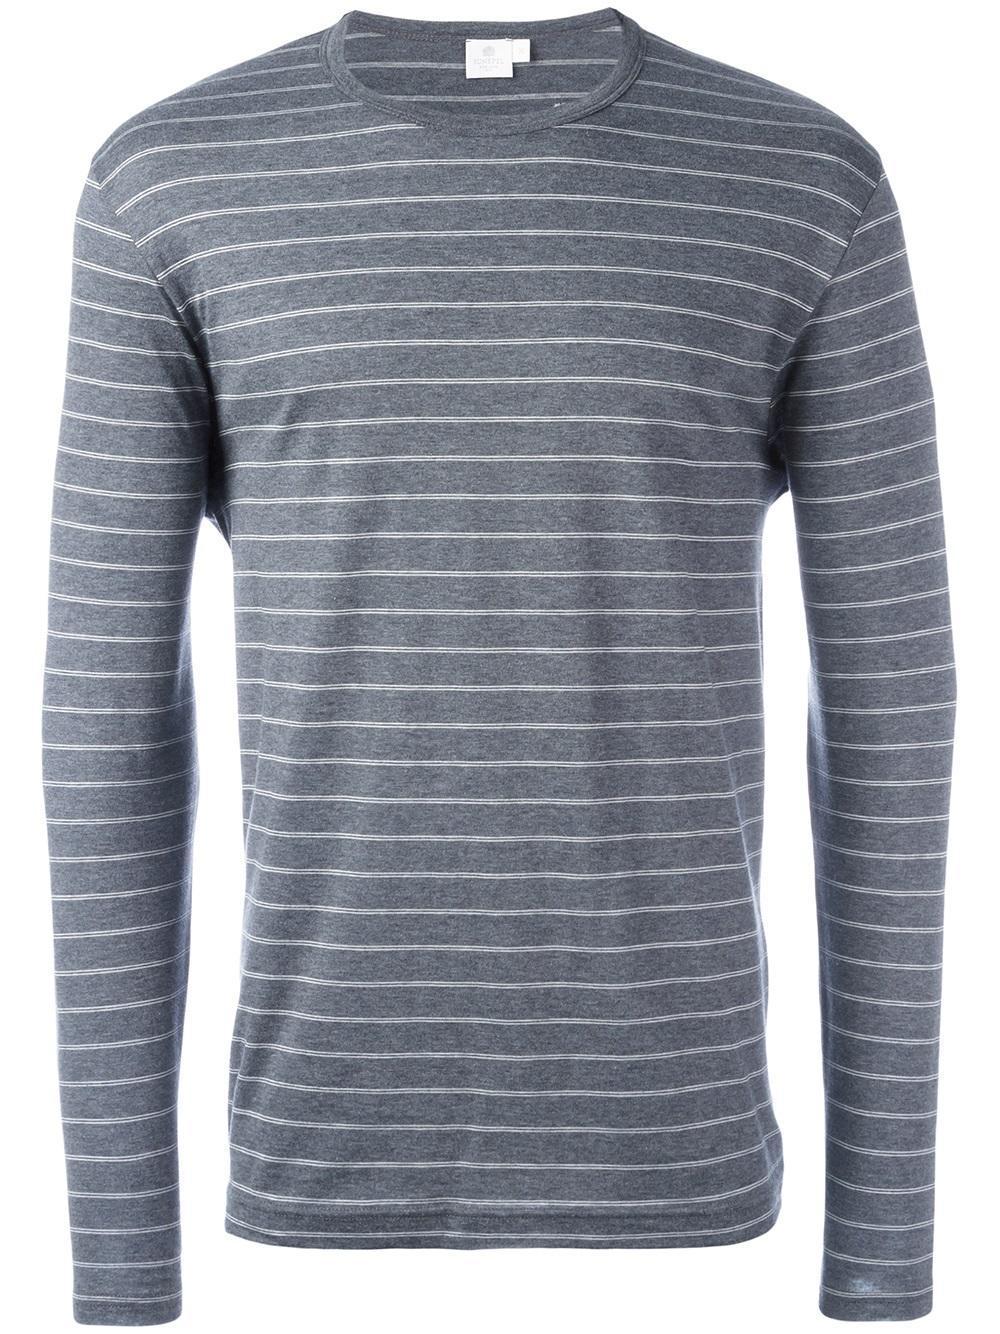 Sunspel striped t shirt in gray for men lyst Grey striped t shirt